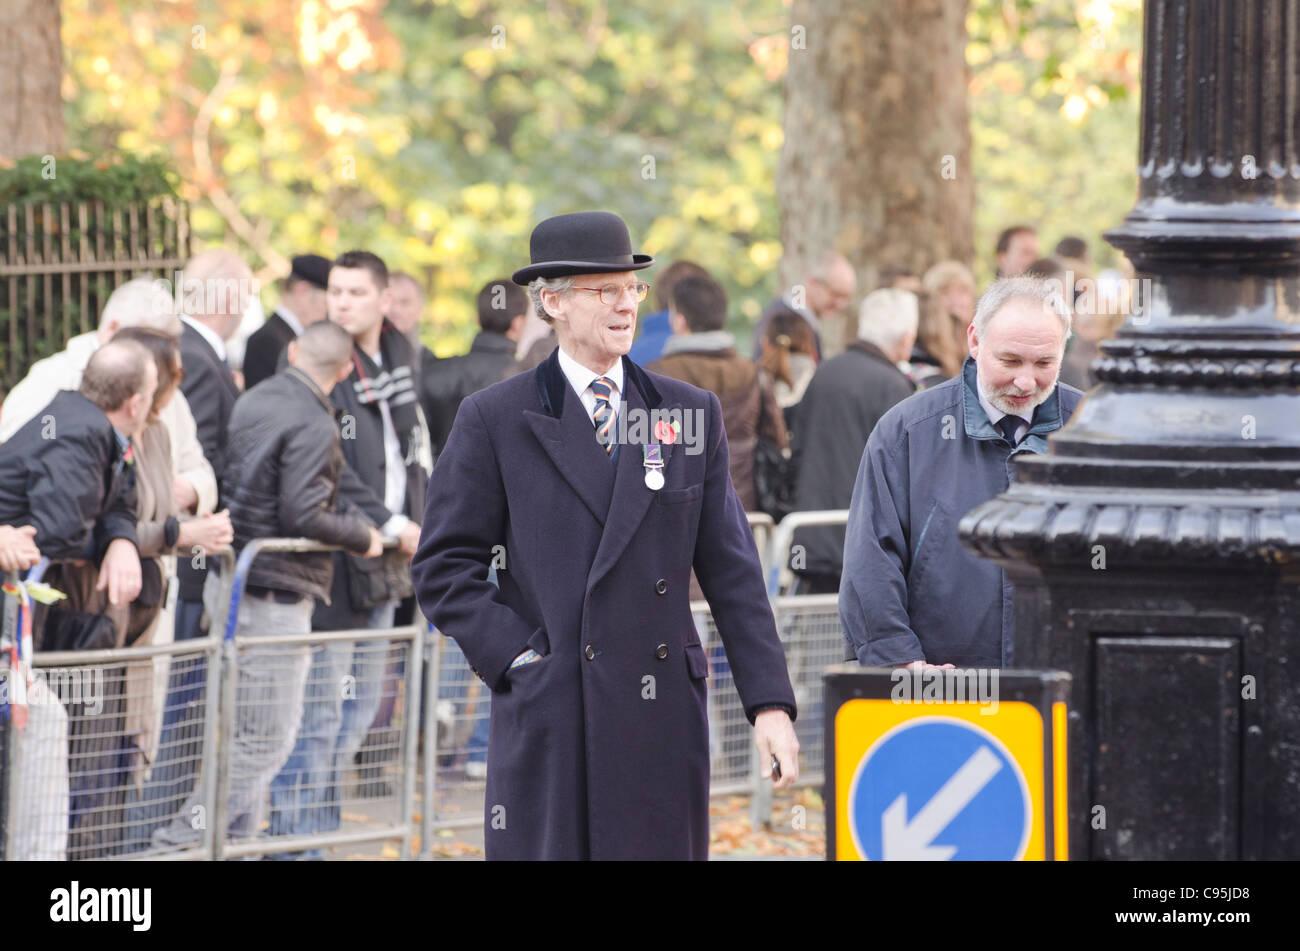 f8d48d99ecc Old Soldier wearing bowler hat at Remembrance Sunday London 2011 War  veteran Uk - Stock Image